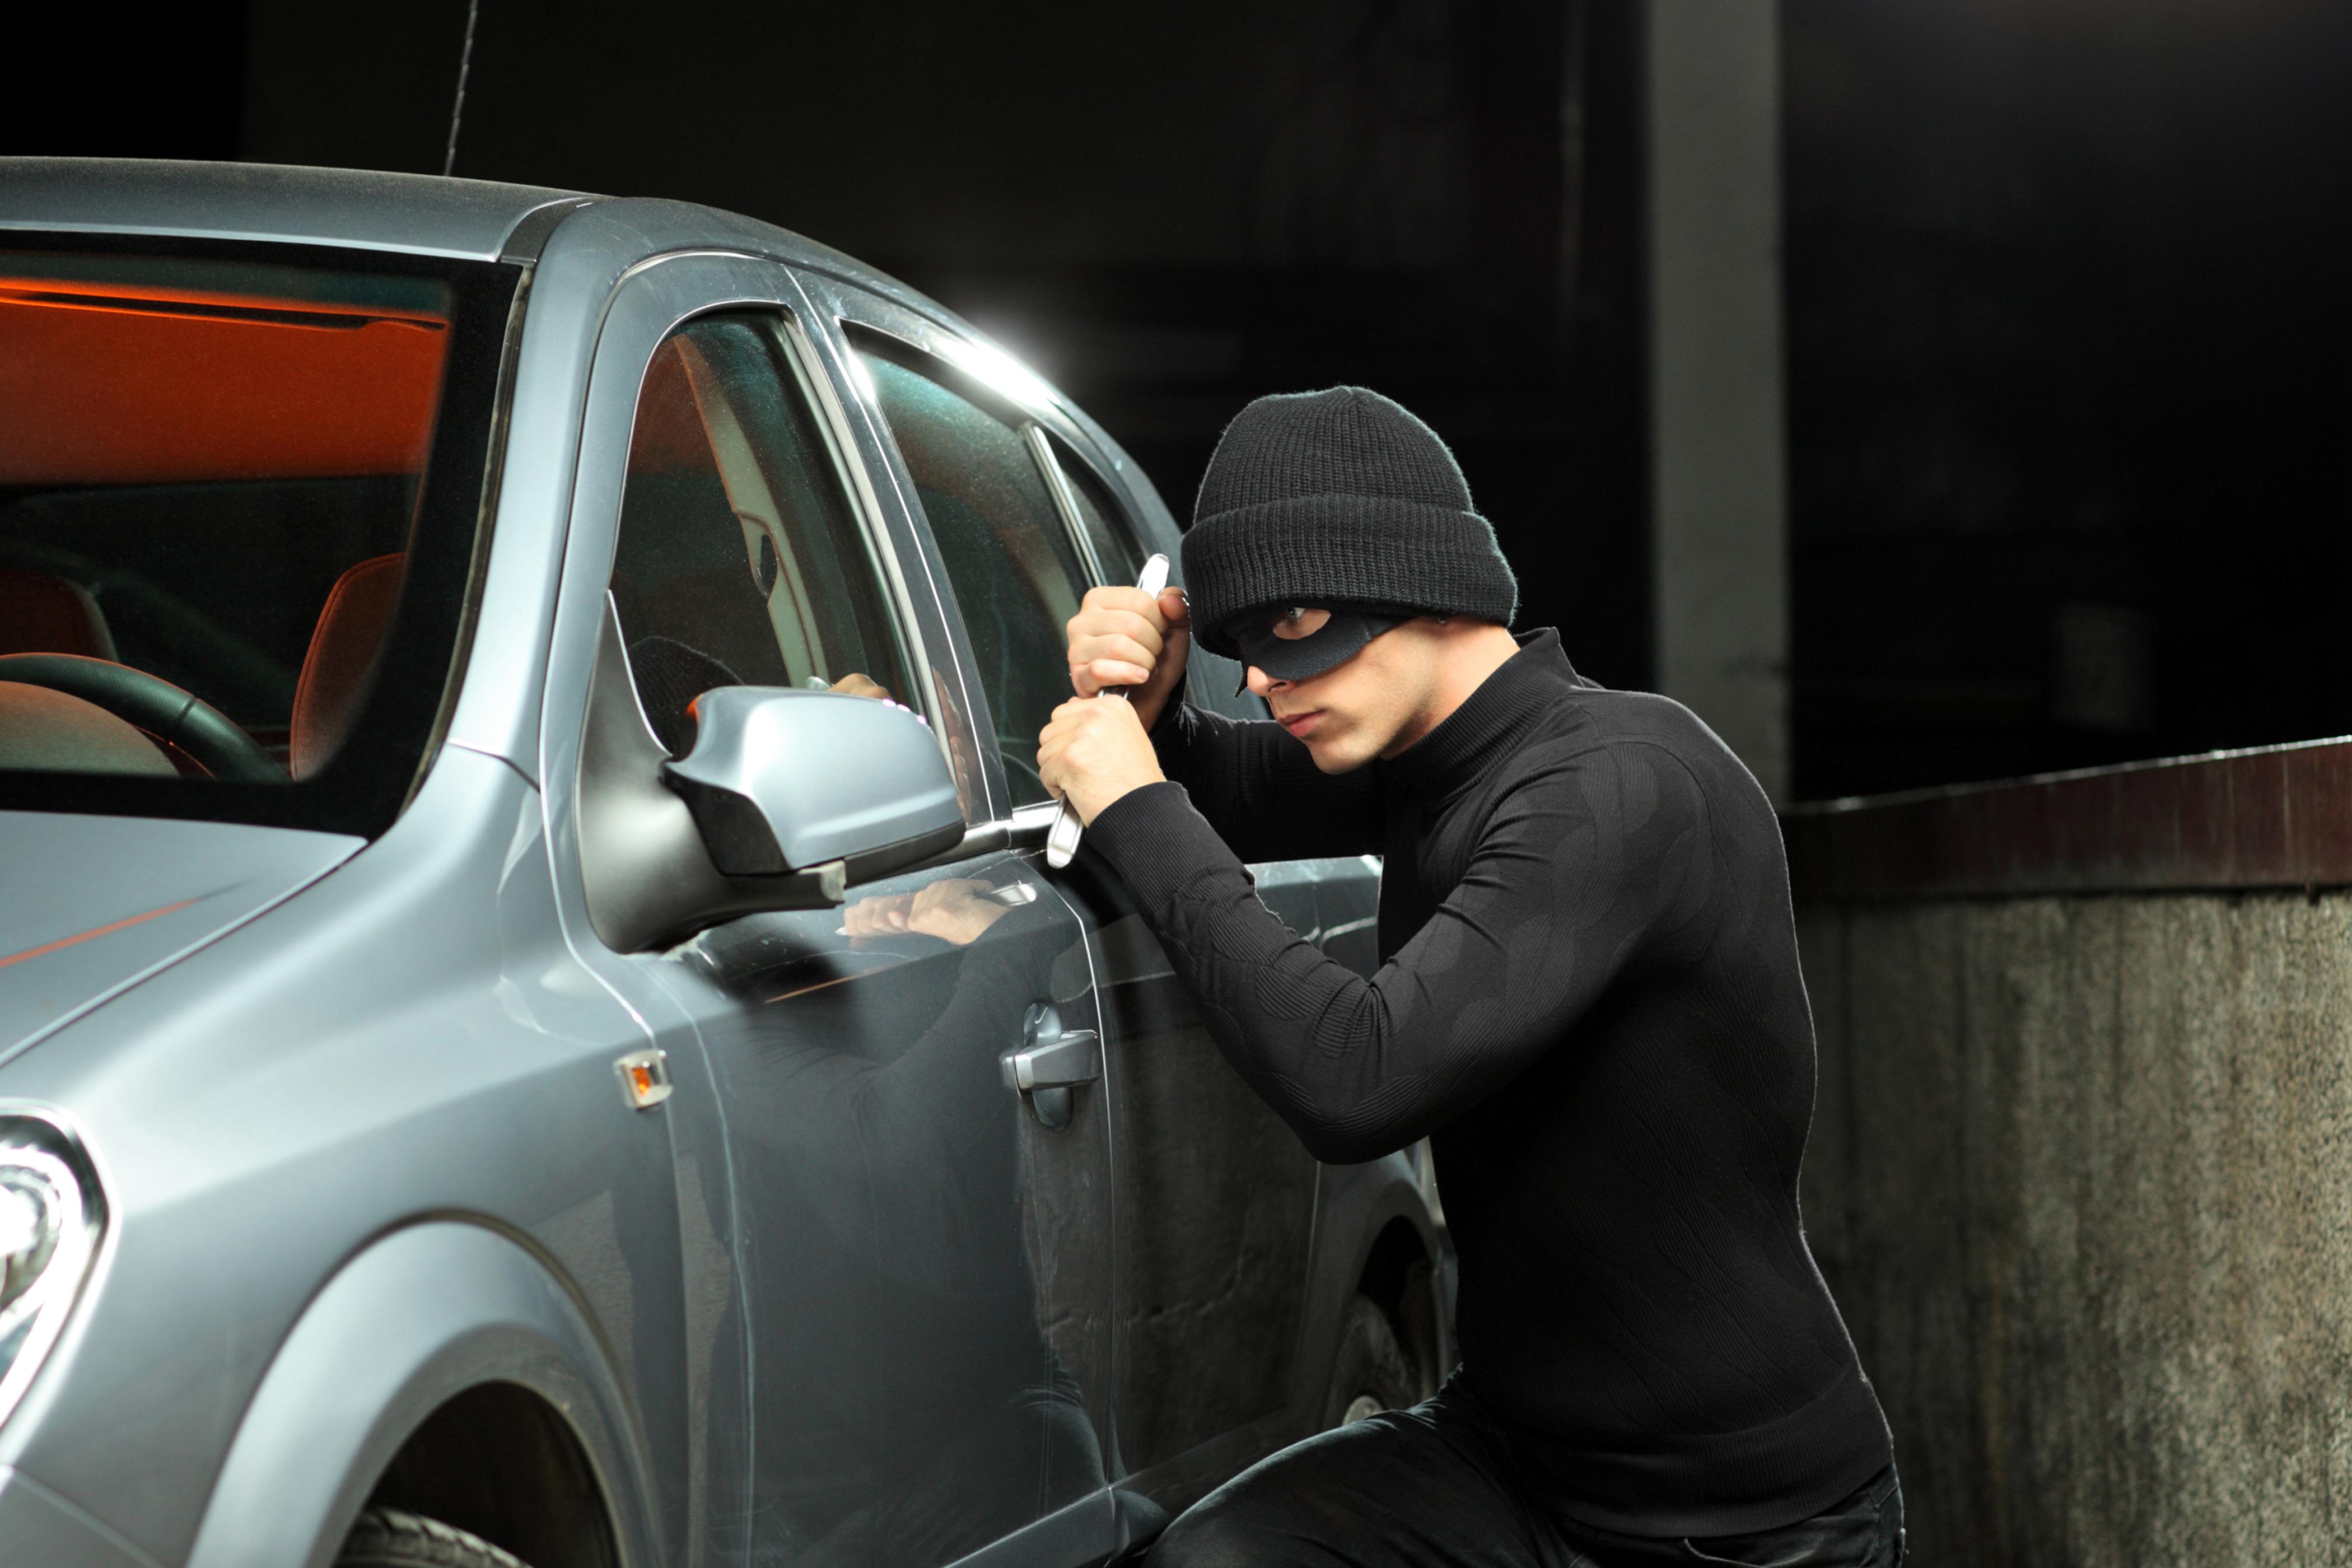 Diefstal personen auto's daalt